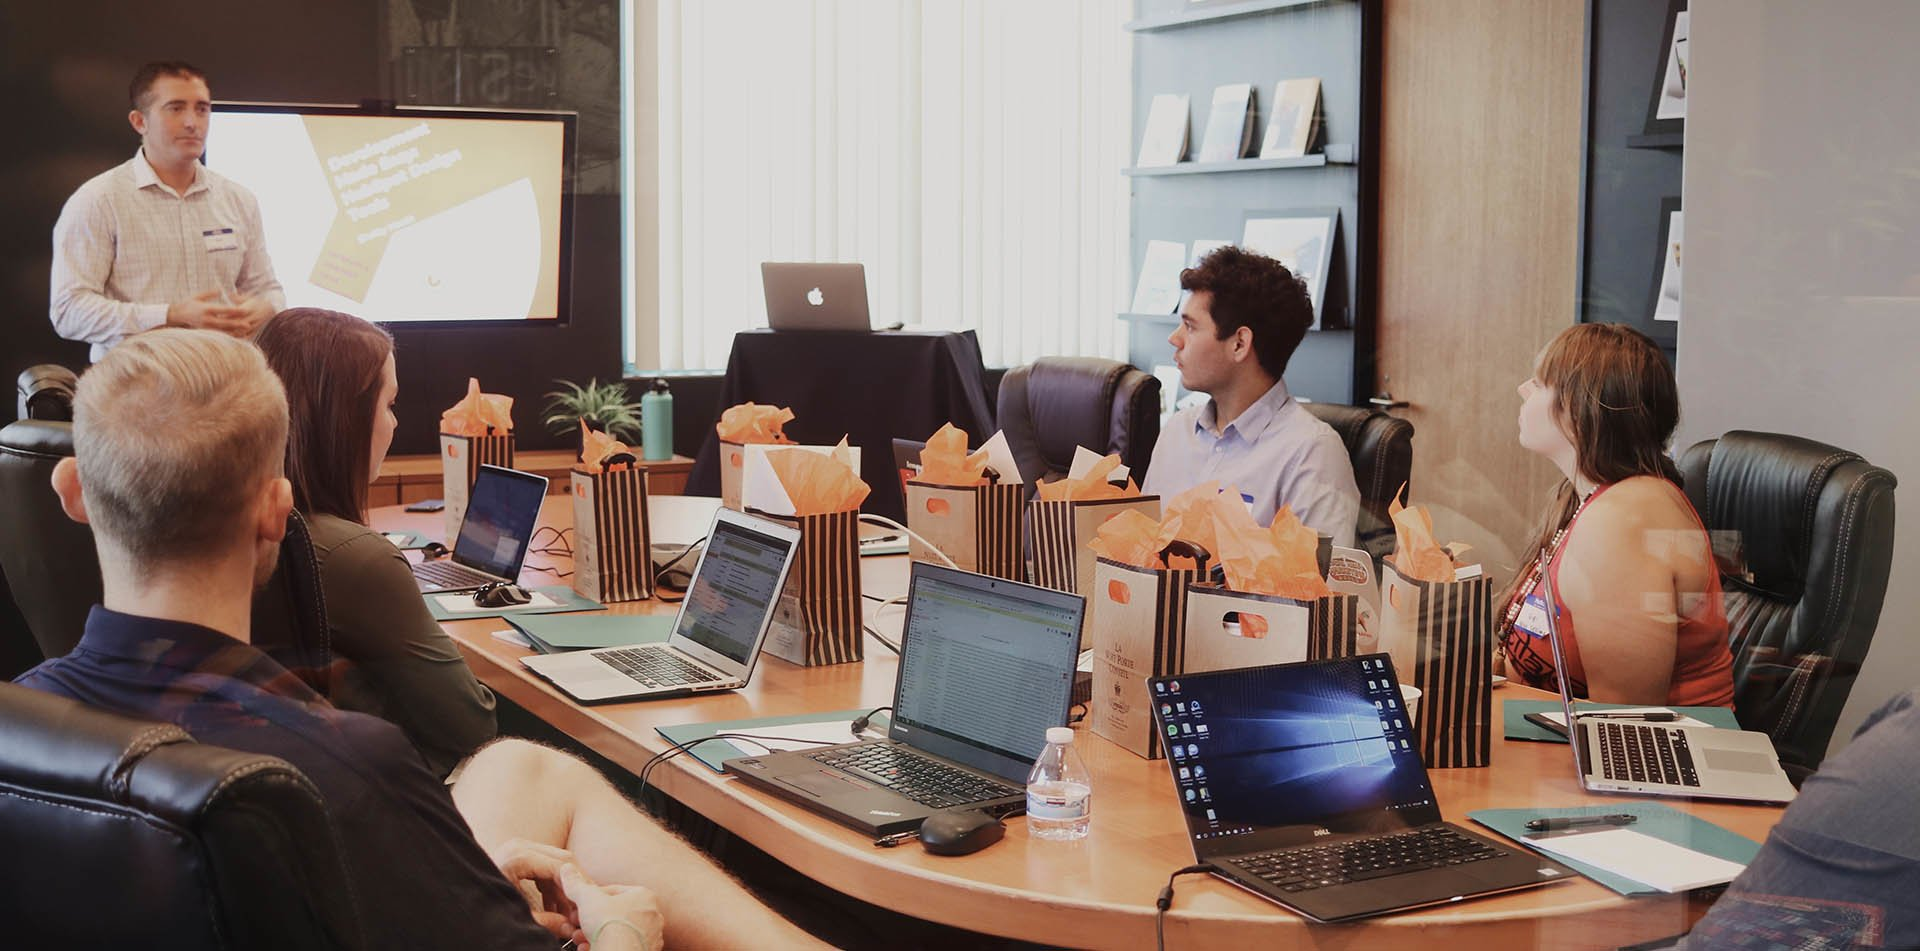 Szkolenia OpenShift, Docker, Kubernetes, DevOps